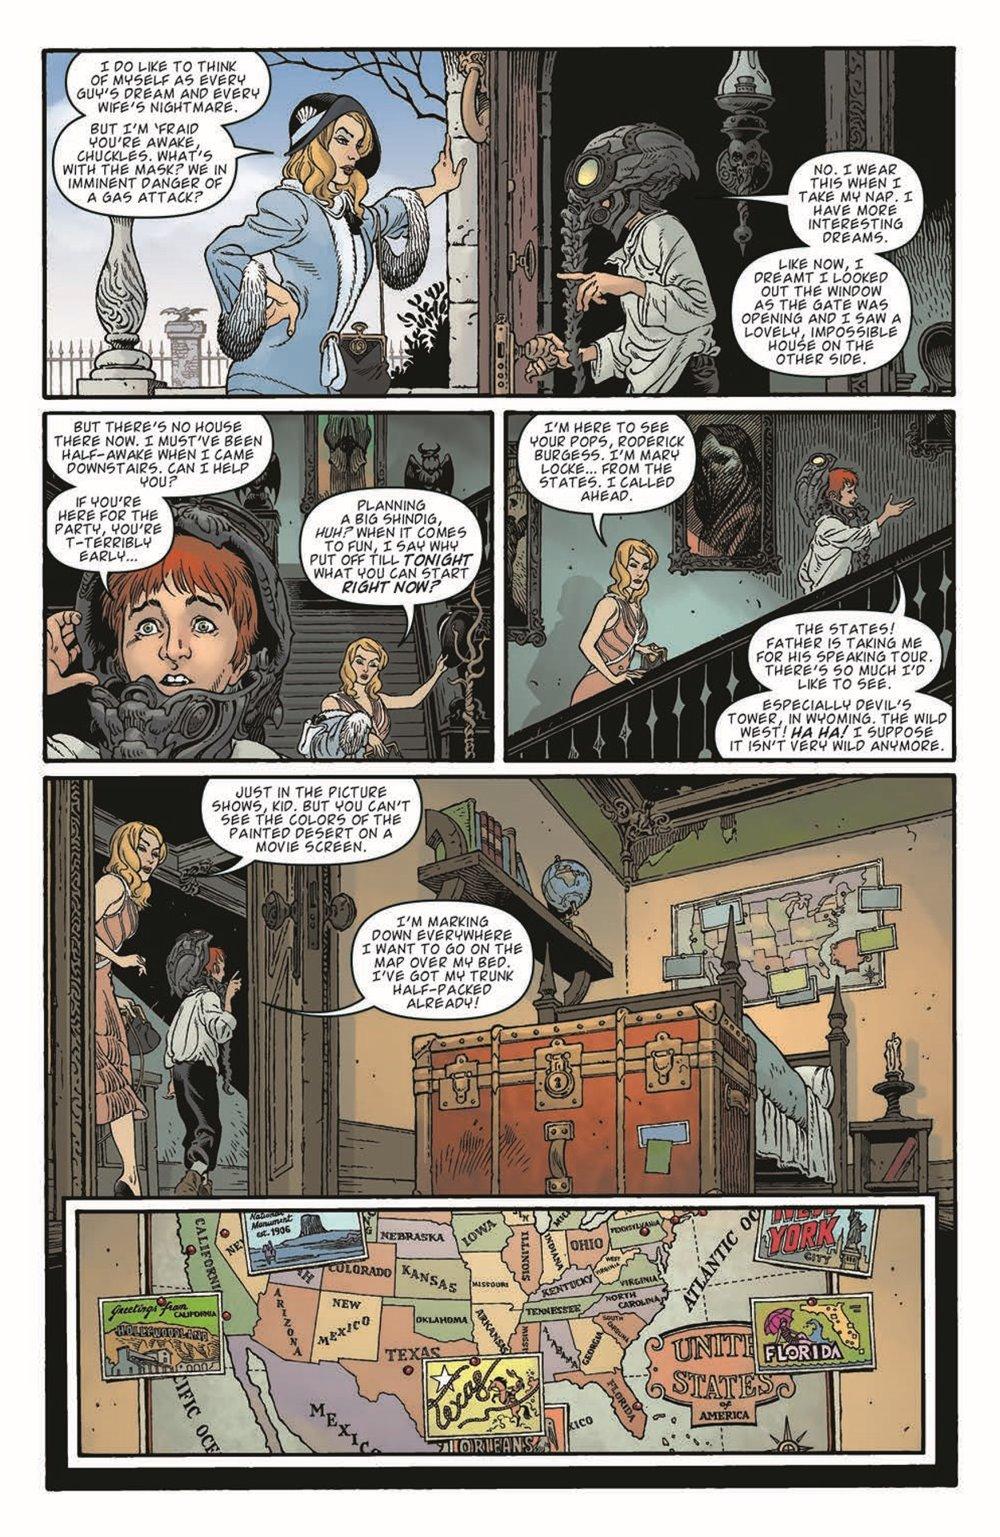 LnK-Sandman01_pr-7 ComicList Previews: LOCKE AND KEY THE SANDMAN UNIVERSE HELL AND GONE #1